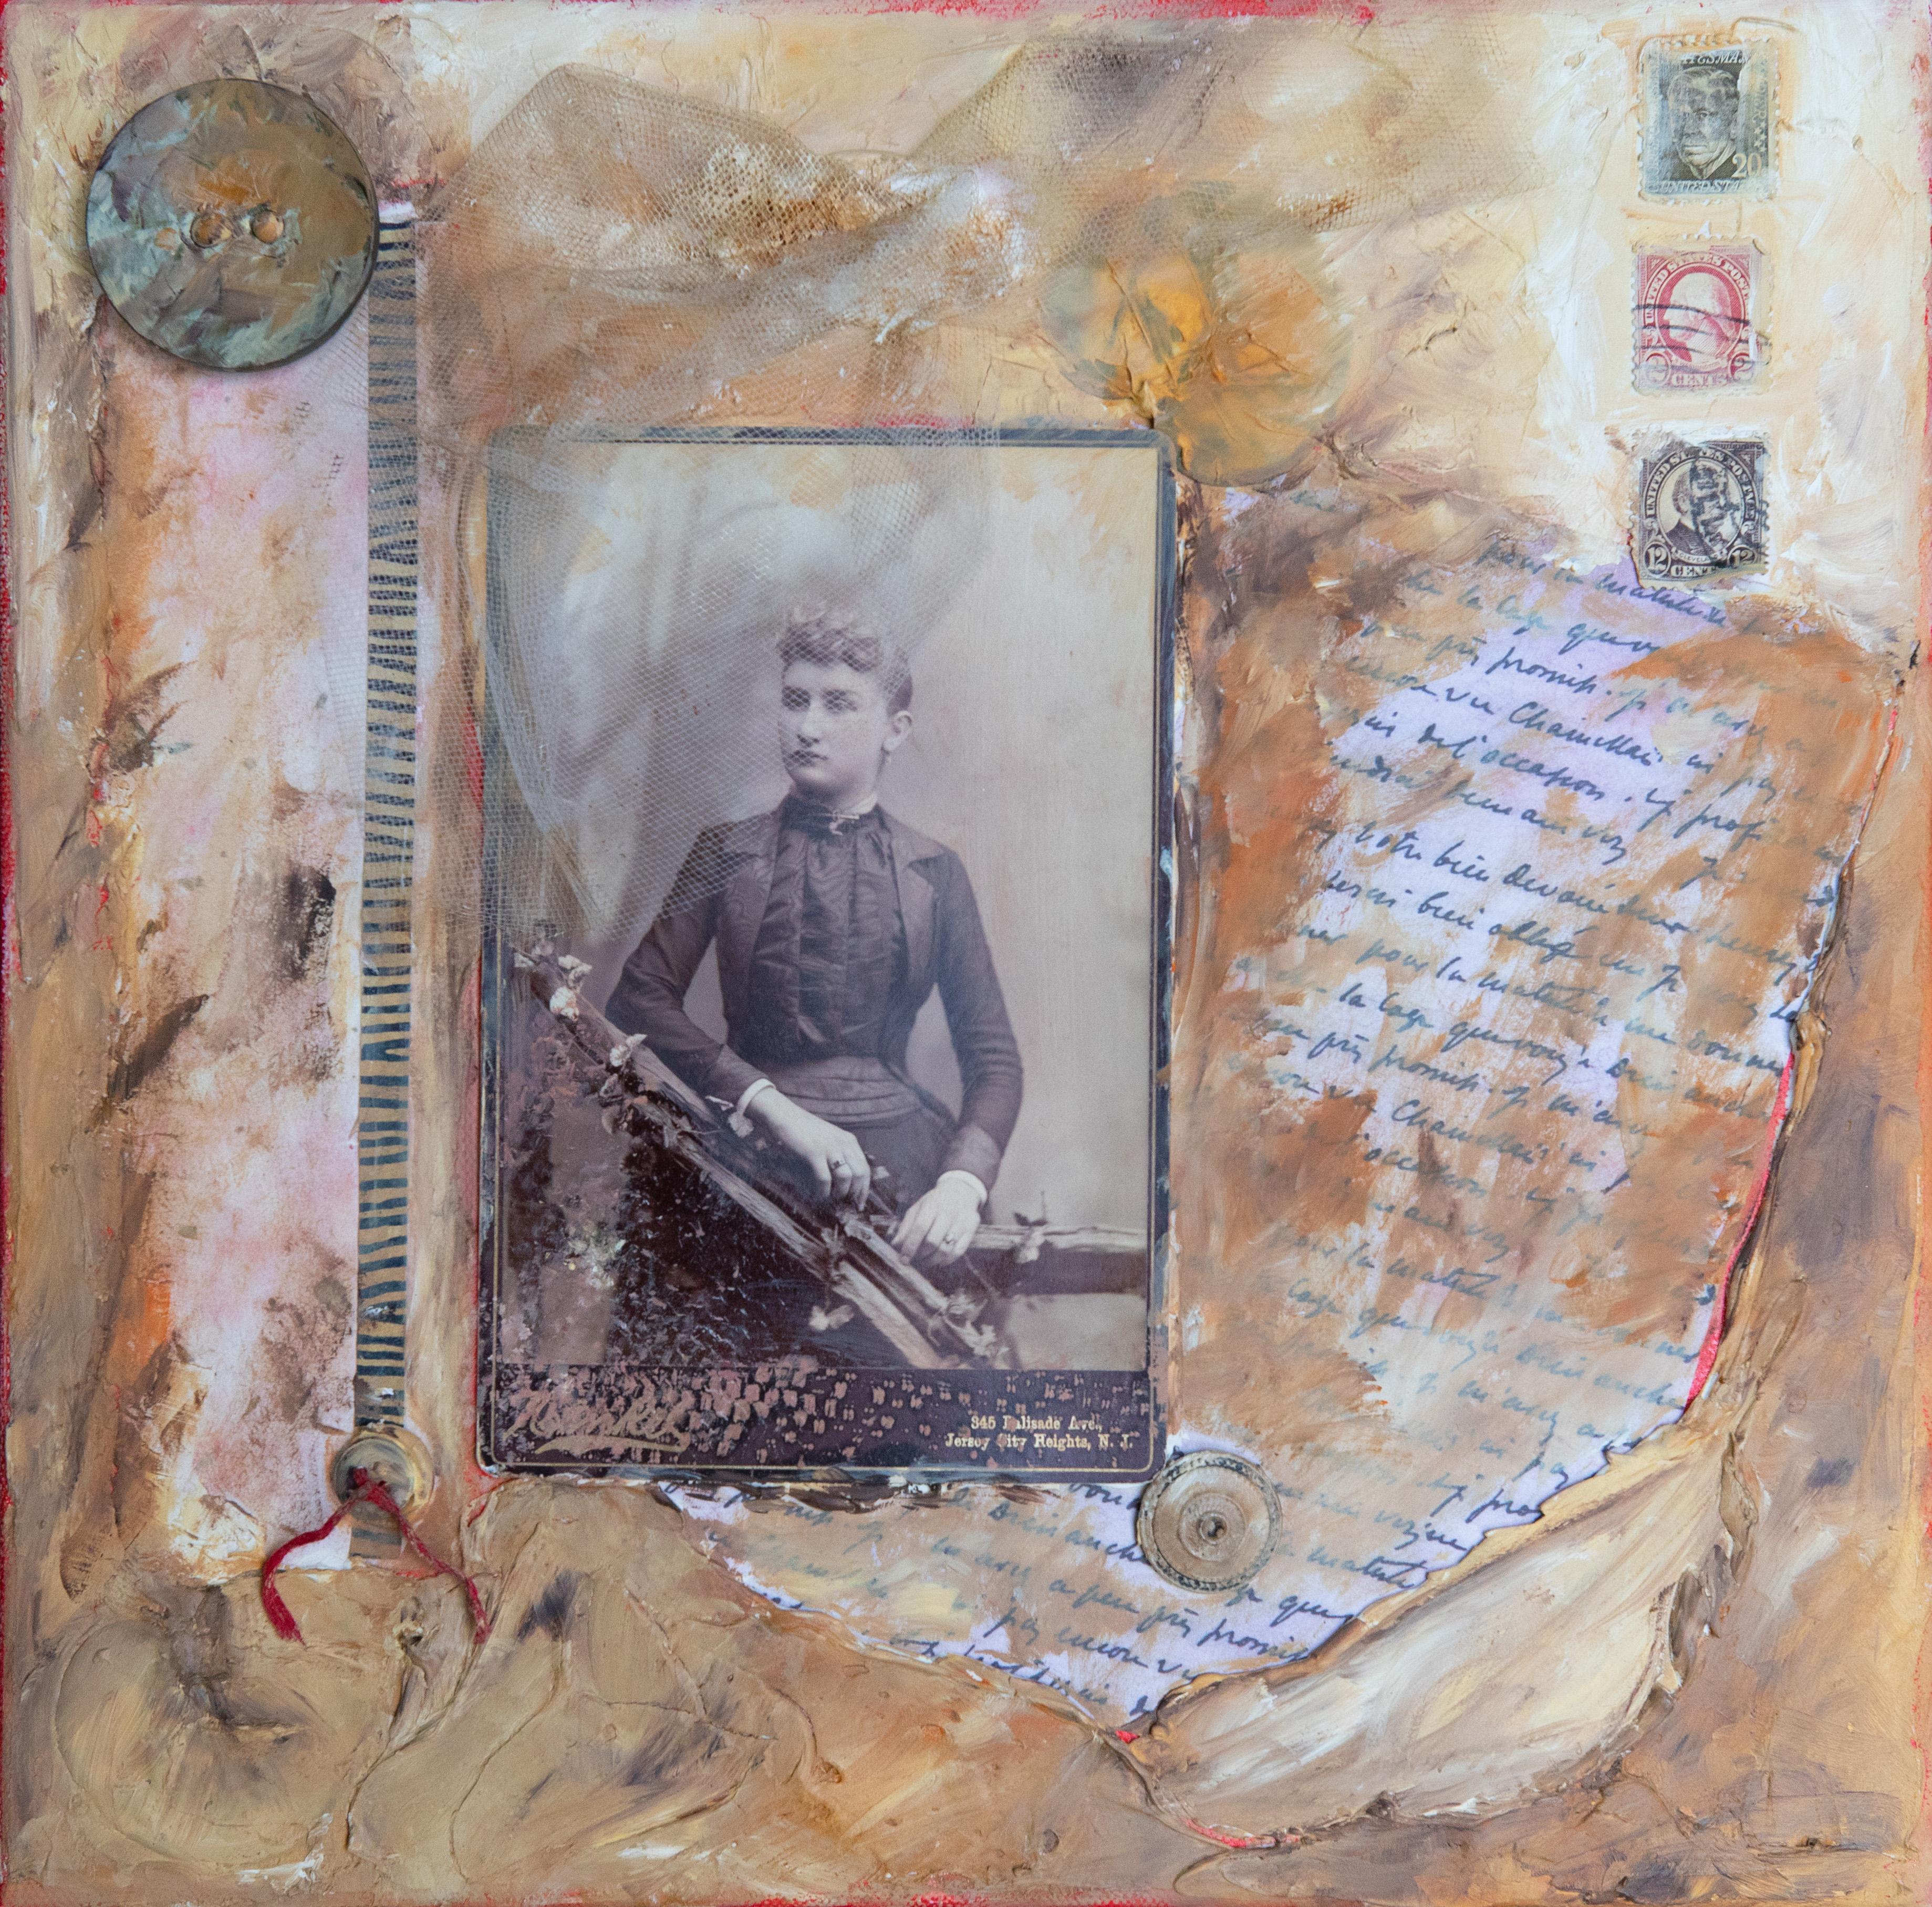 Avec Tendresse, work by Toni Scott (MG: August 2019)